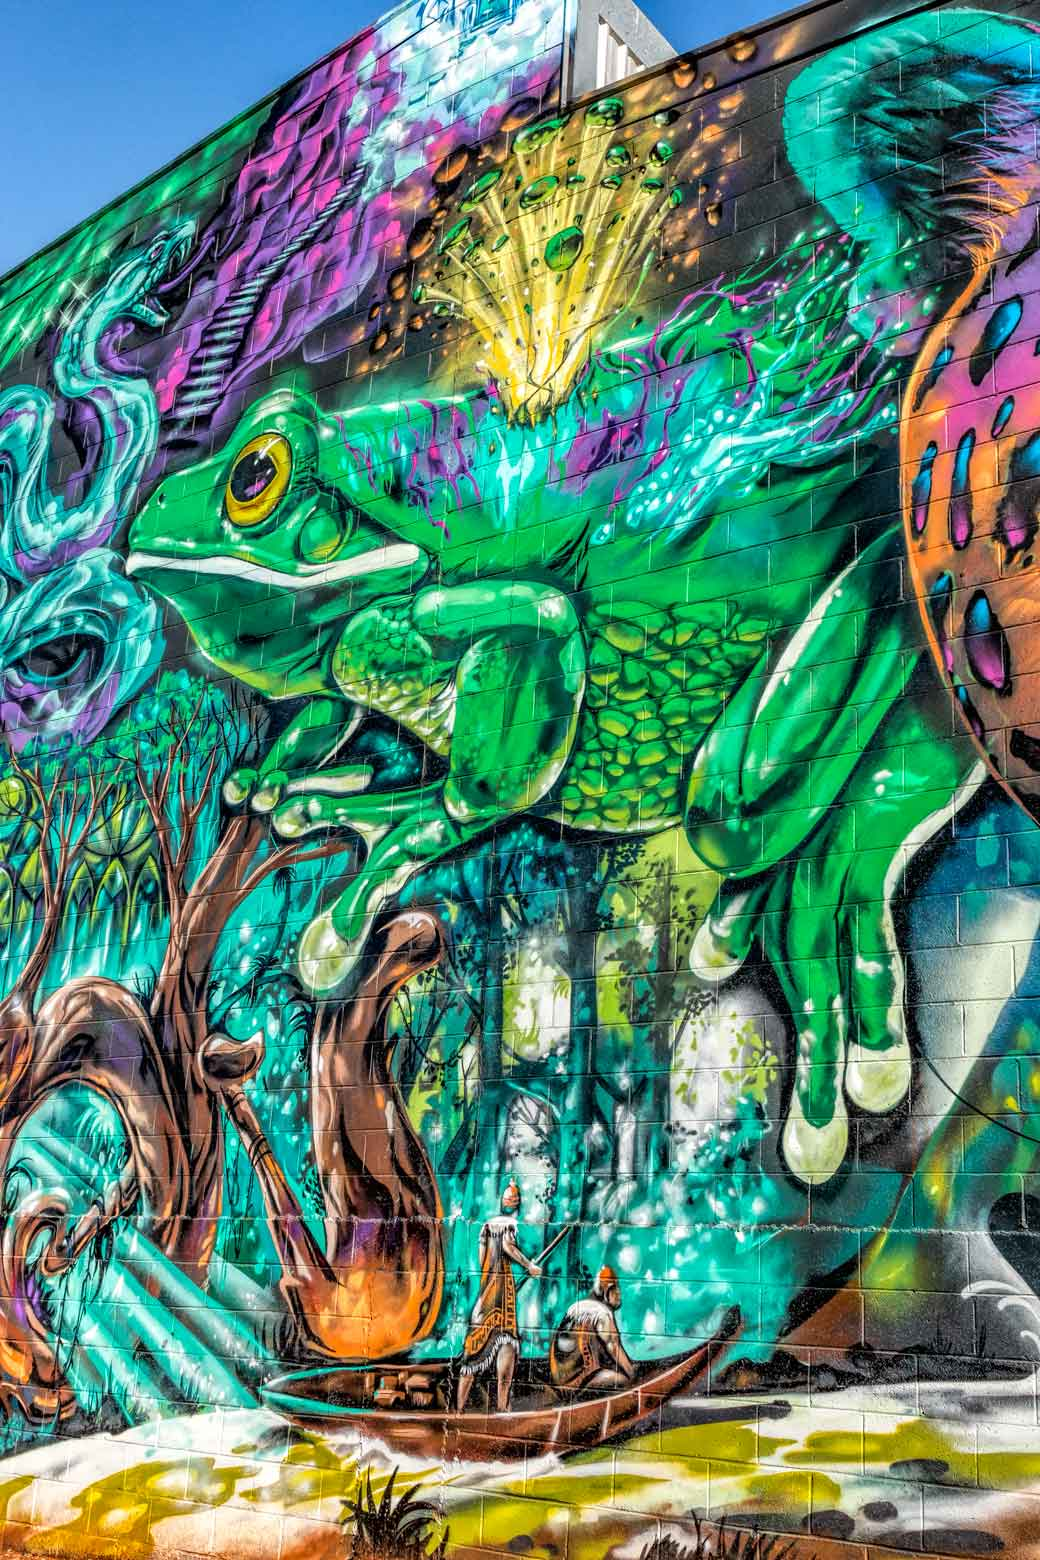 Street art of fantasy Amazon scene on brick building in Toowoomba